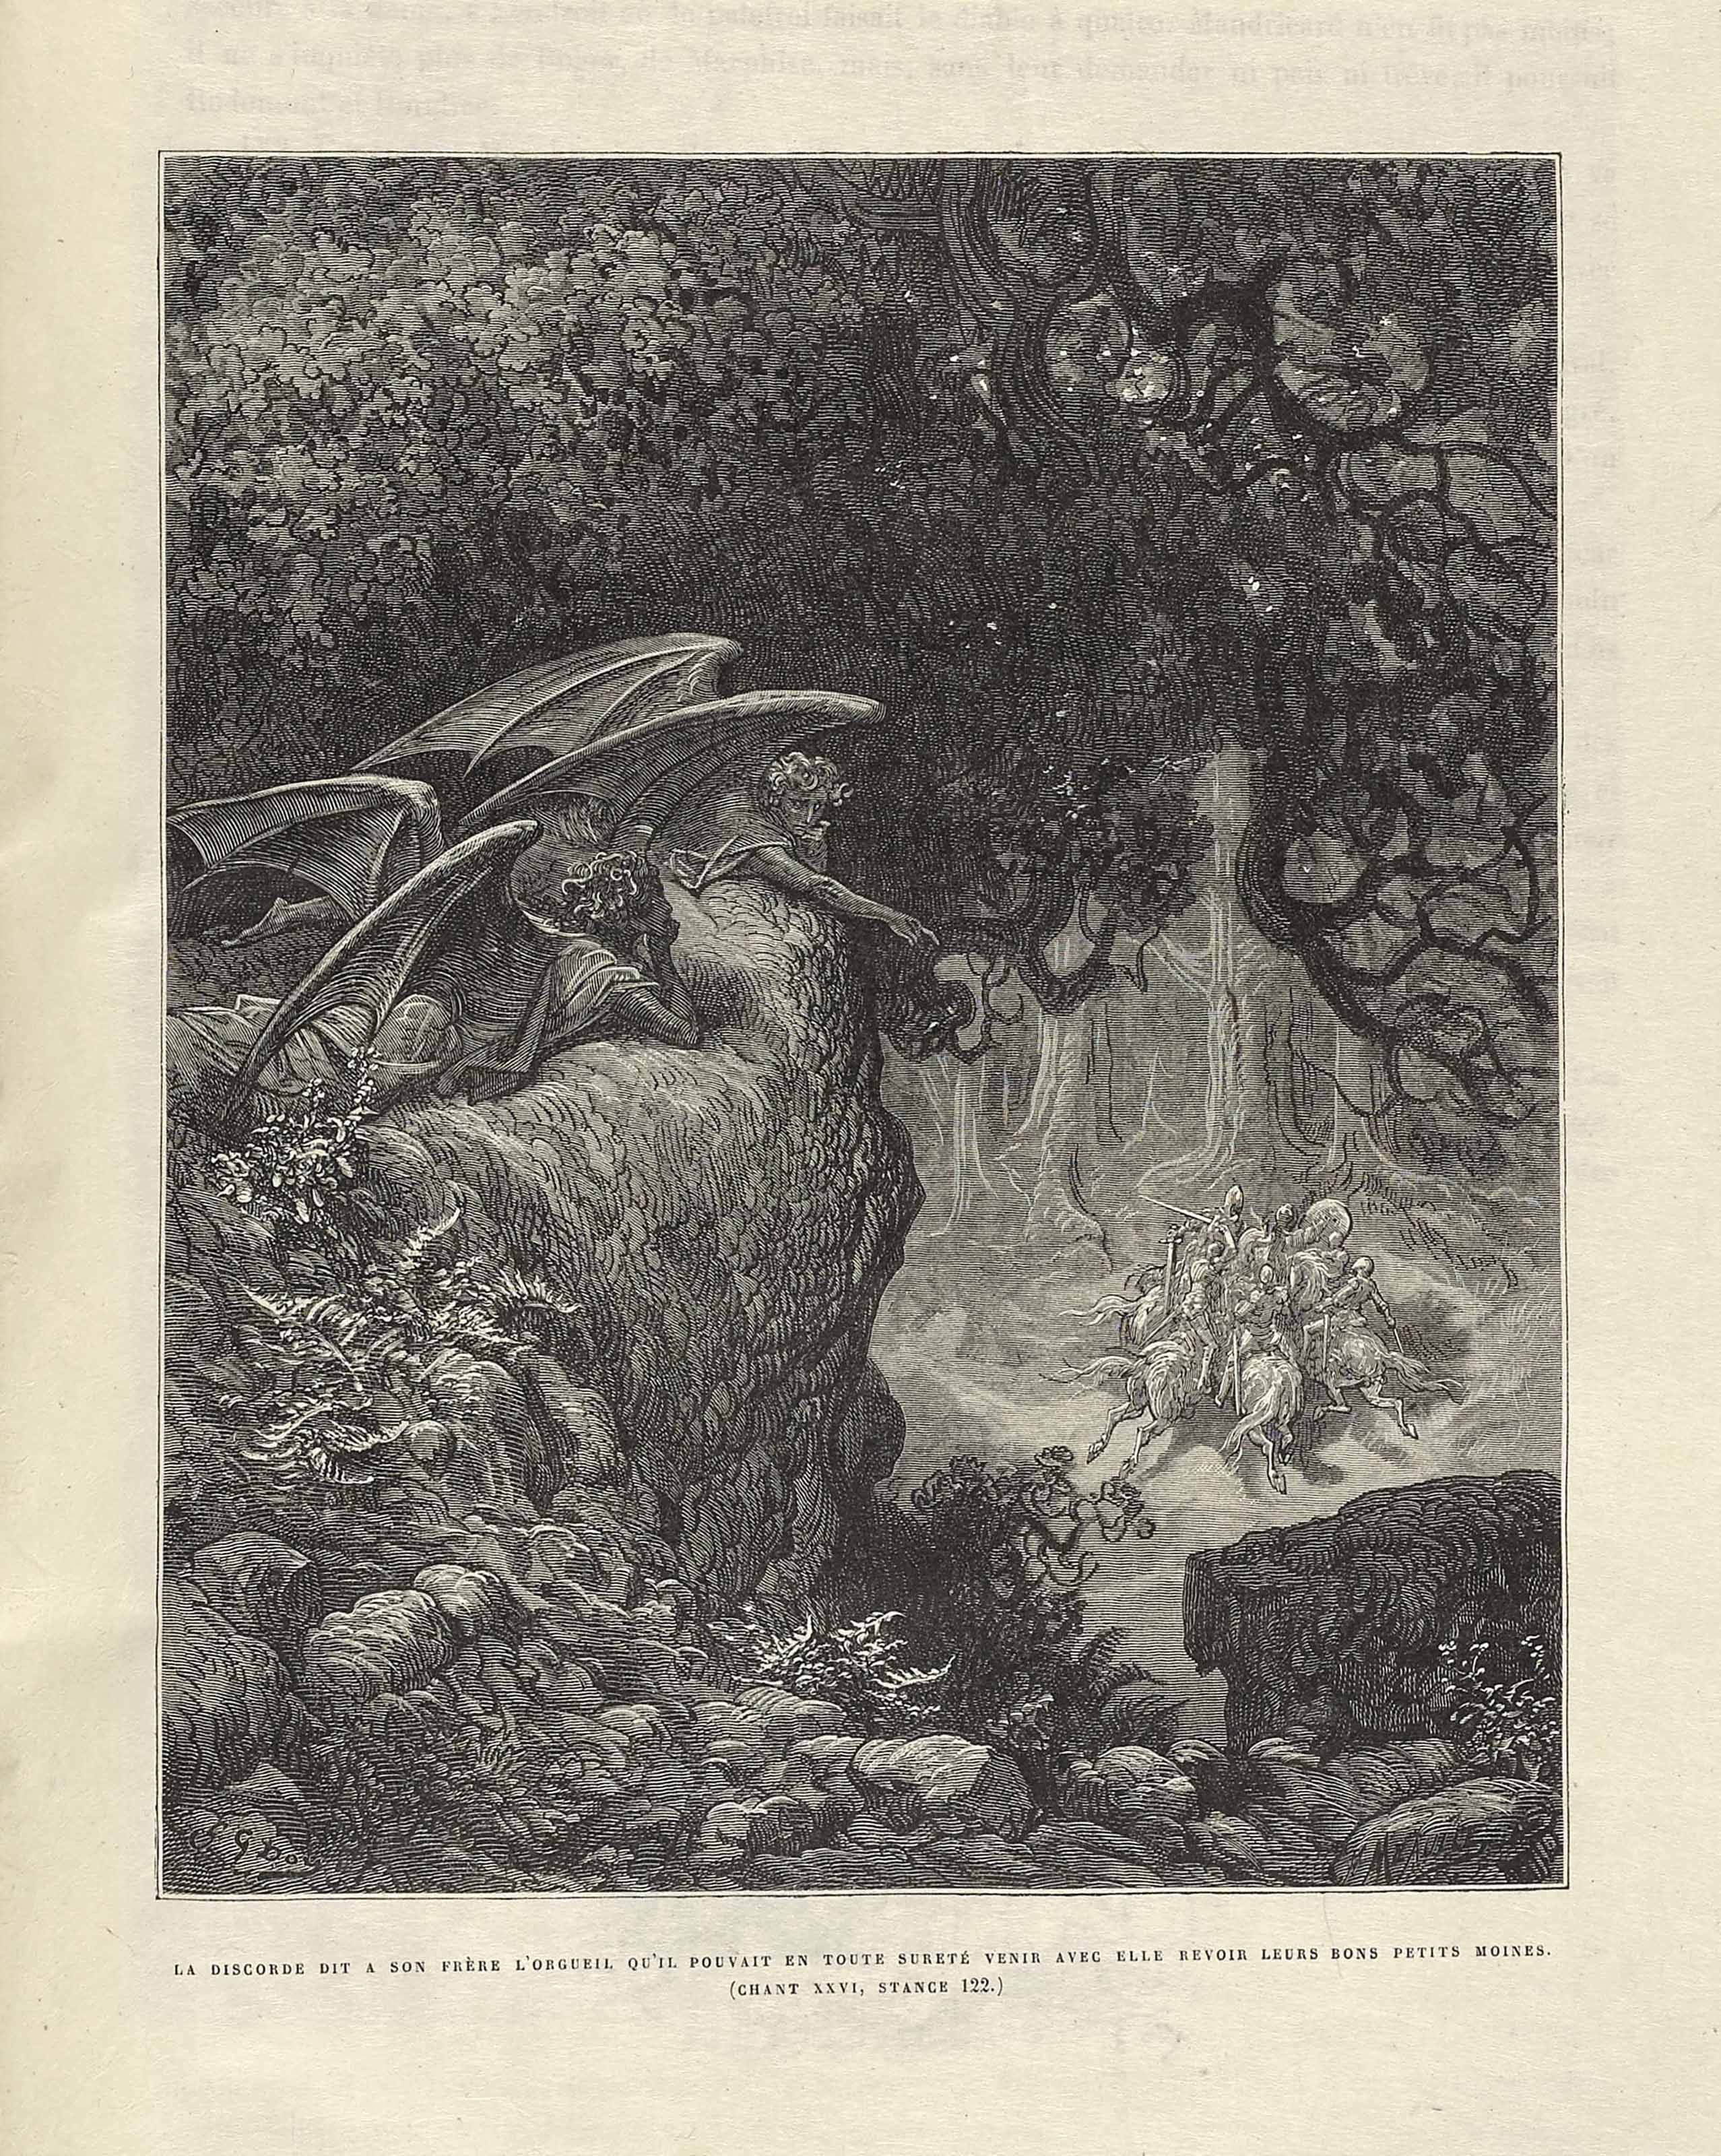 [DORE, Gustave (1832 – 1883)] – ARIOSTO, Ludovico (1474 – 1533). Roland furieux. Paris : Hachette et Cie, 1879.